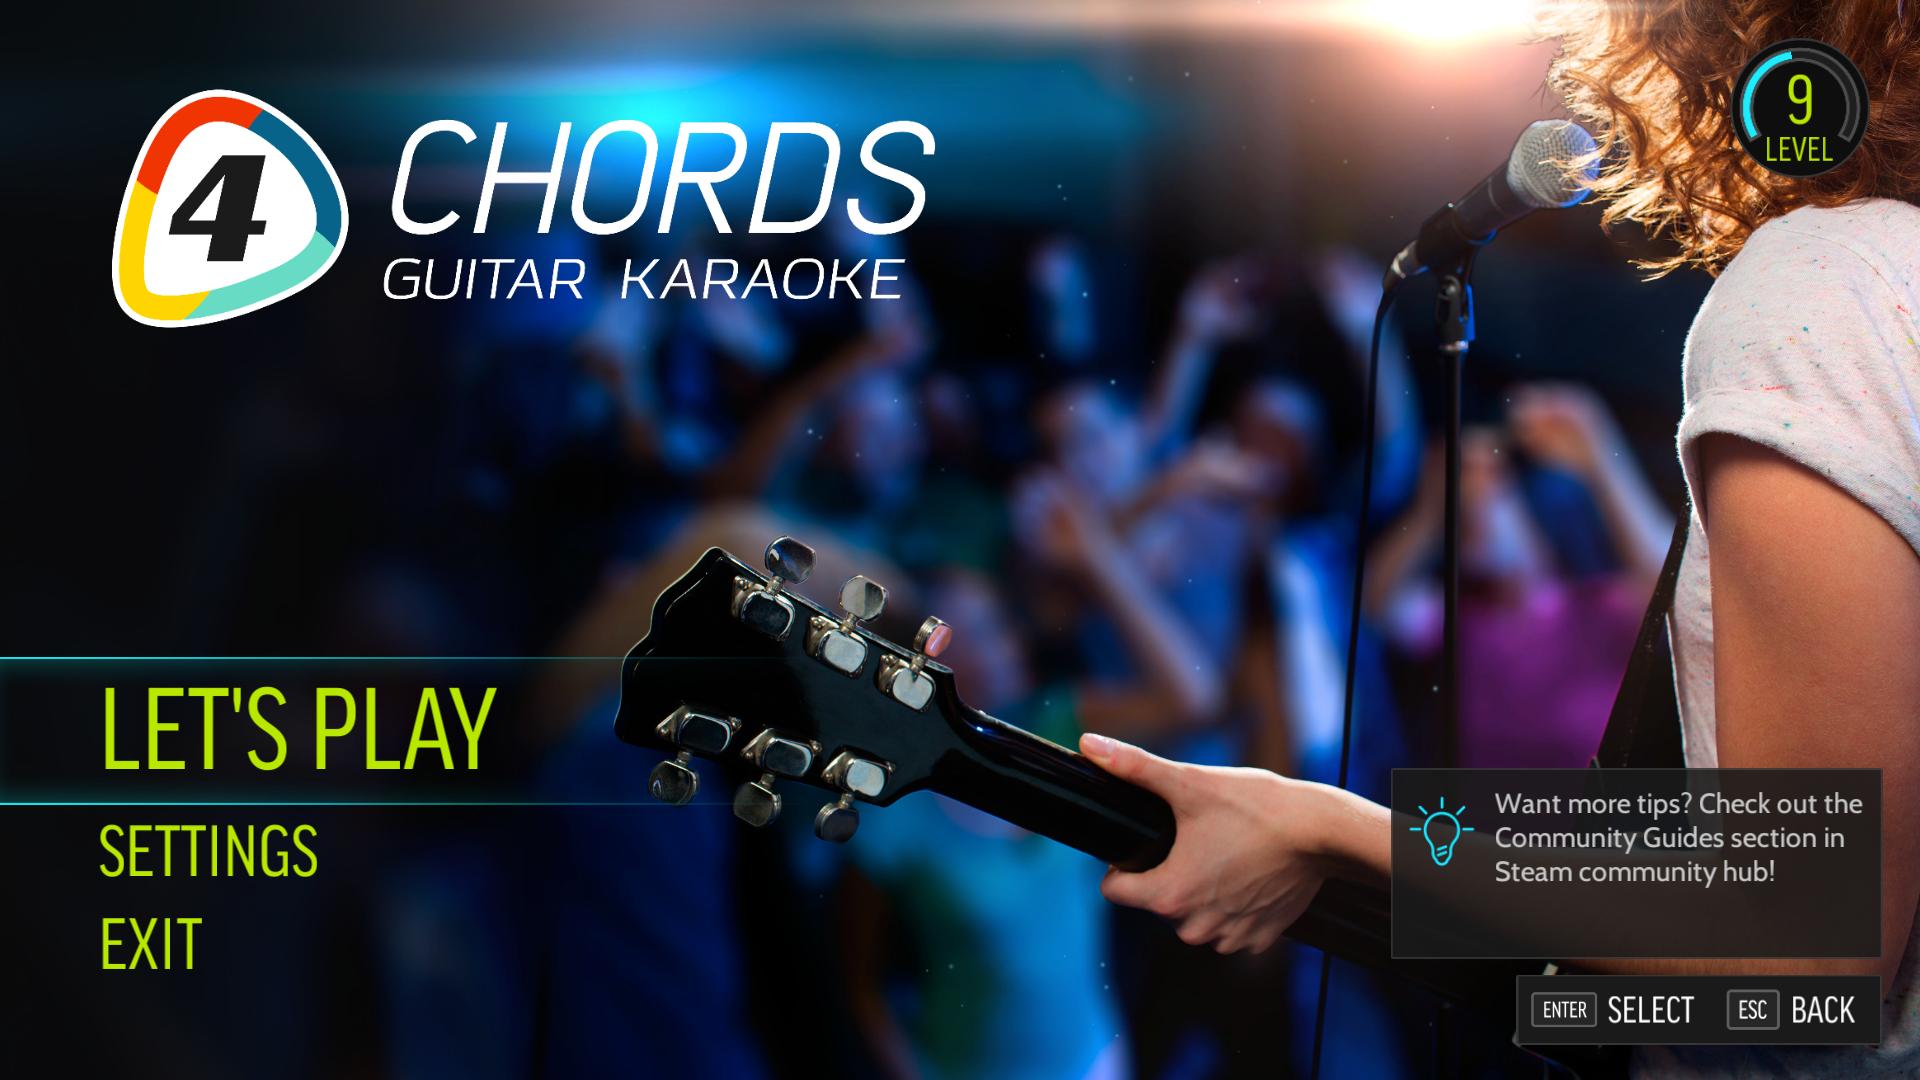 Fourchords Guitar Karaoke Carrie Underwood Song Pack On Steam